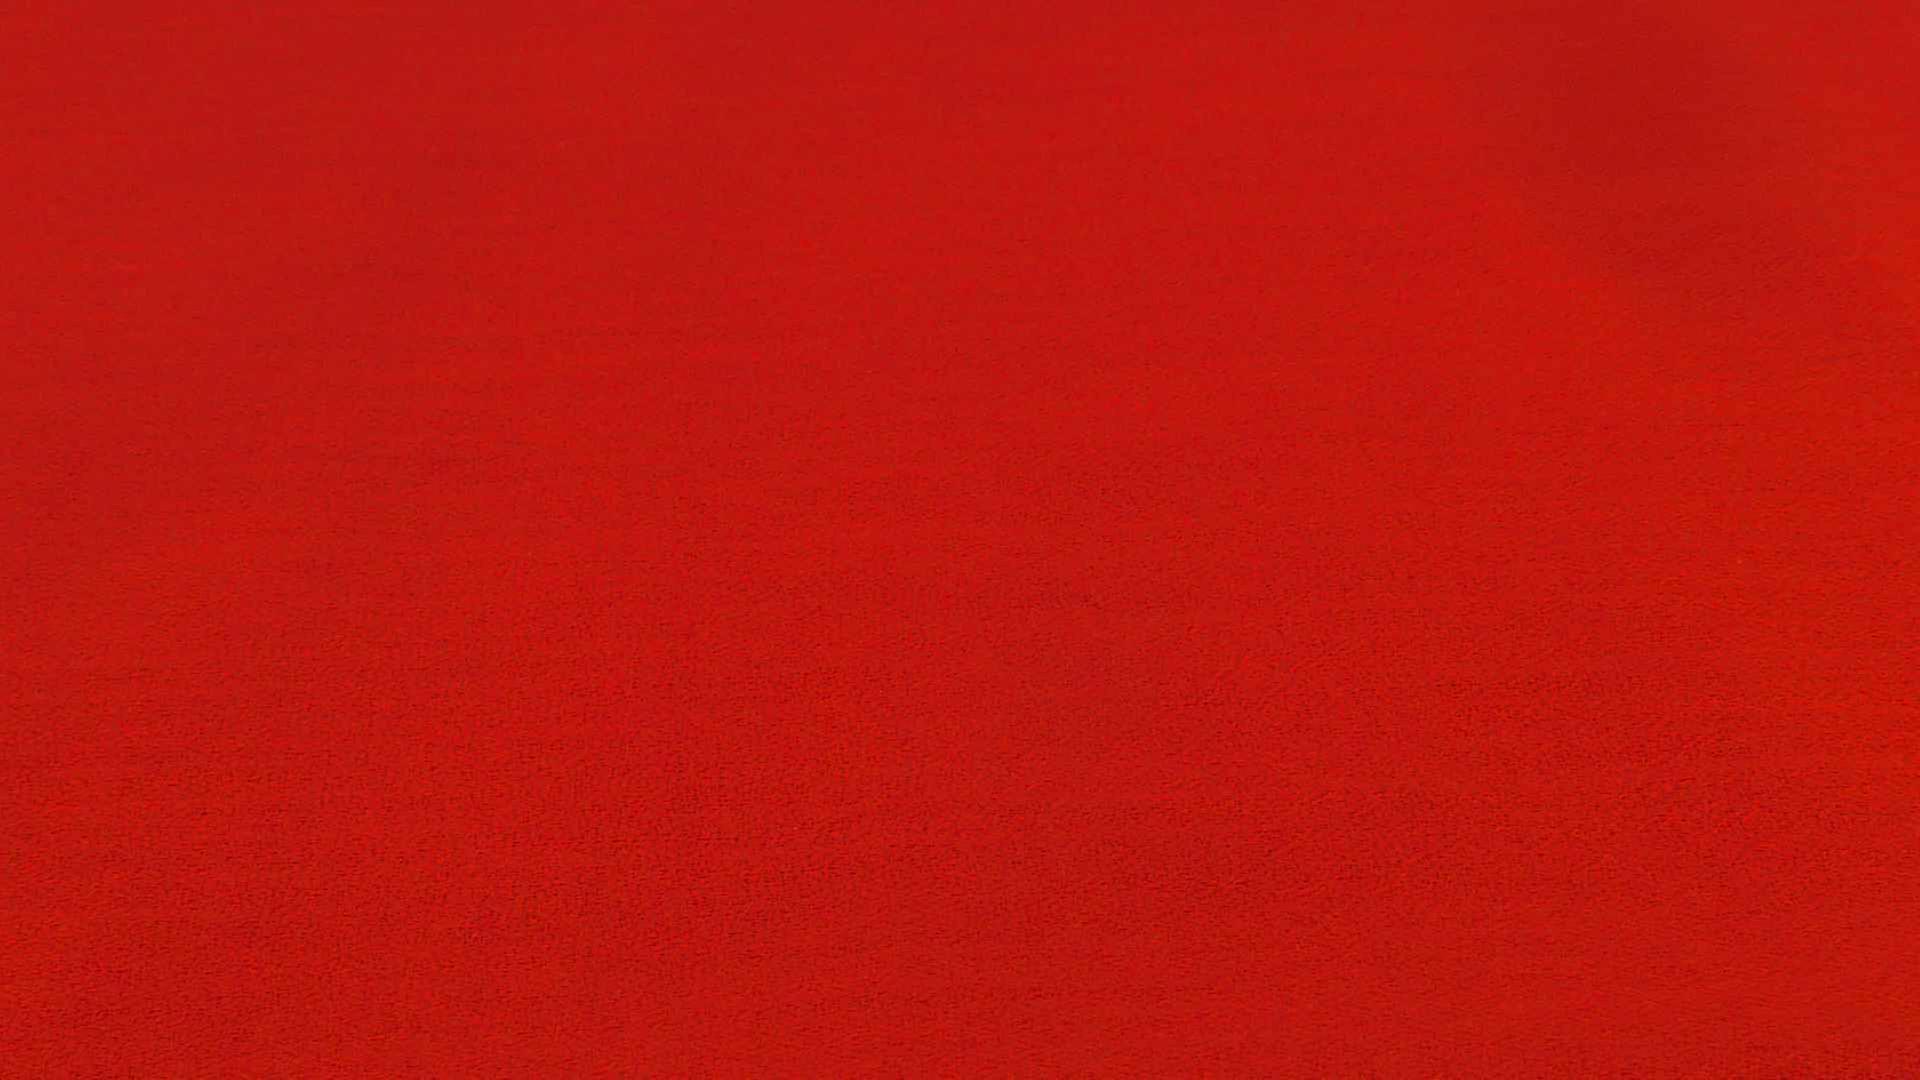 MENS Fine Cashmere Scarf Scarlet by Pashmina & Silk